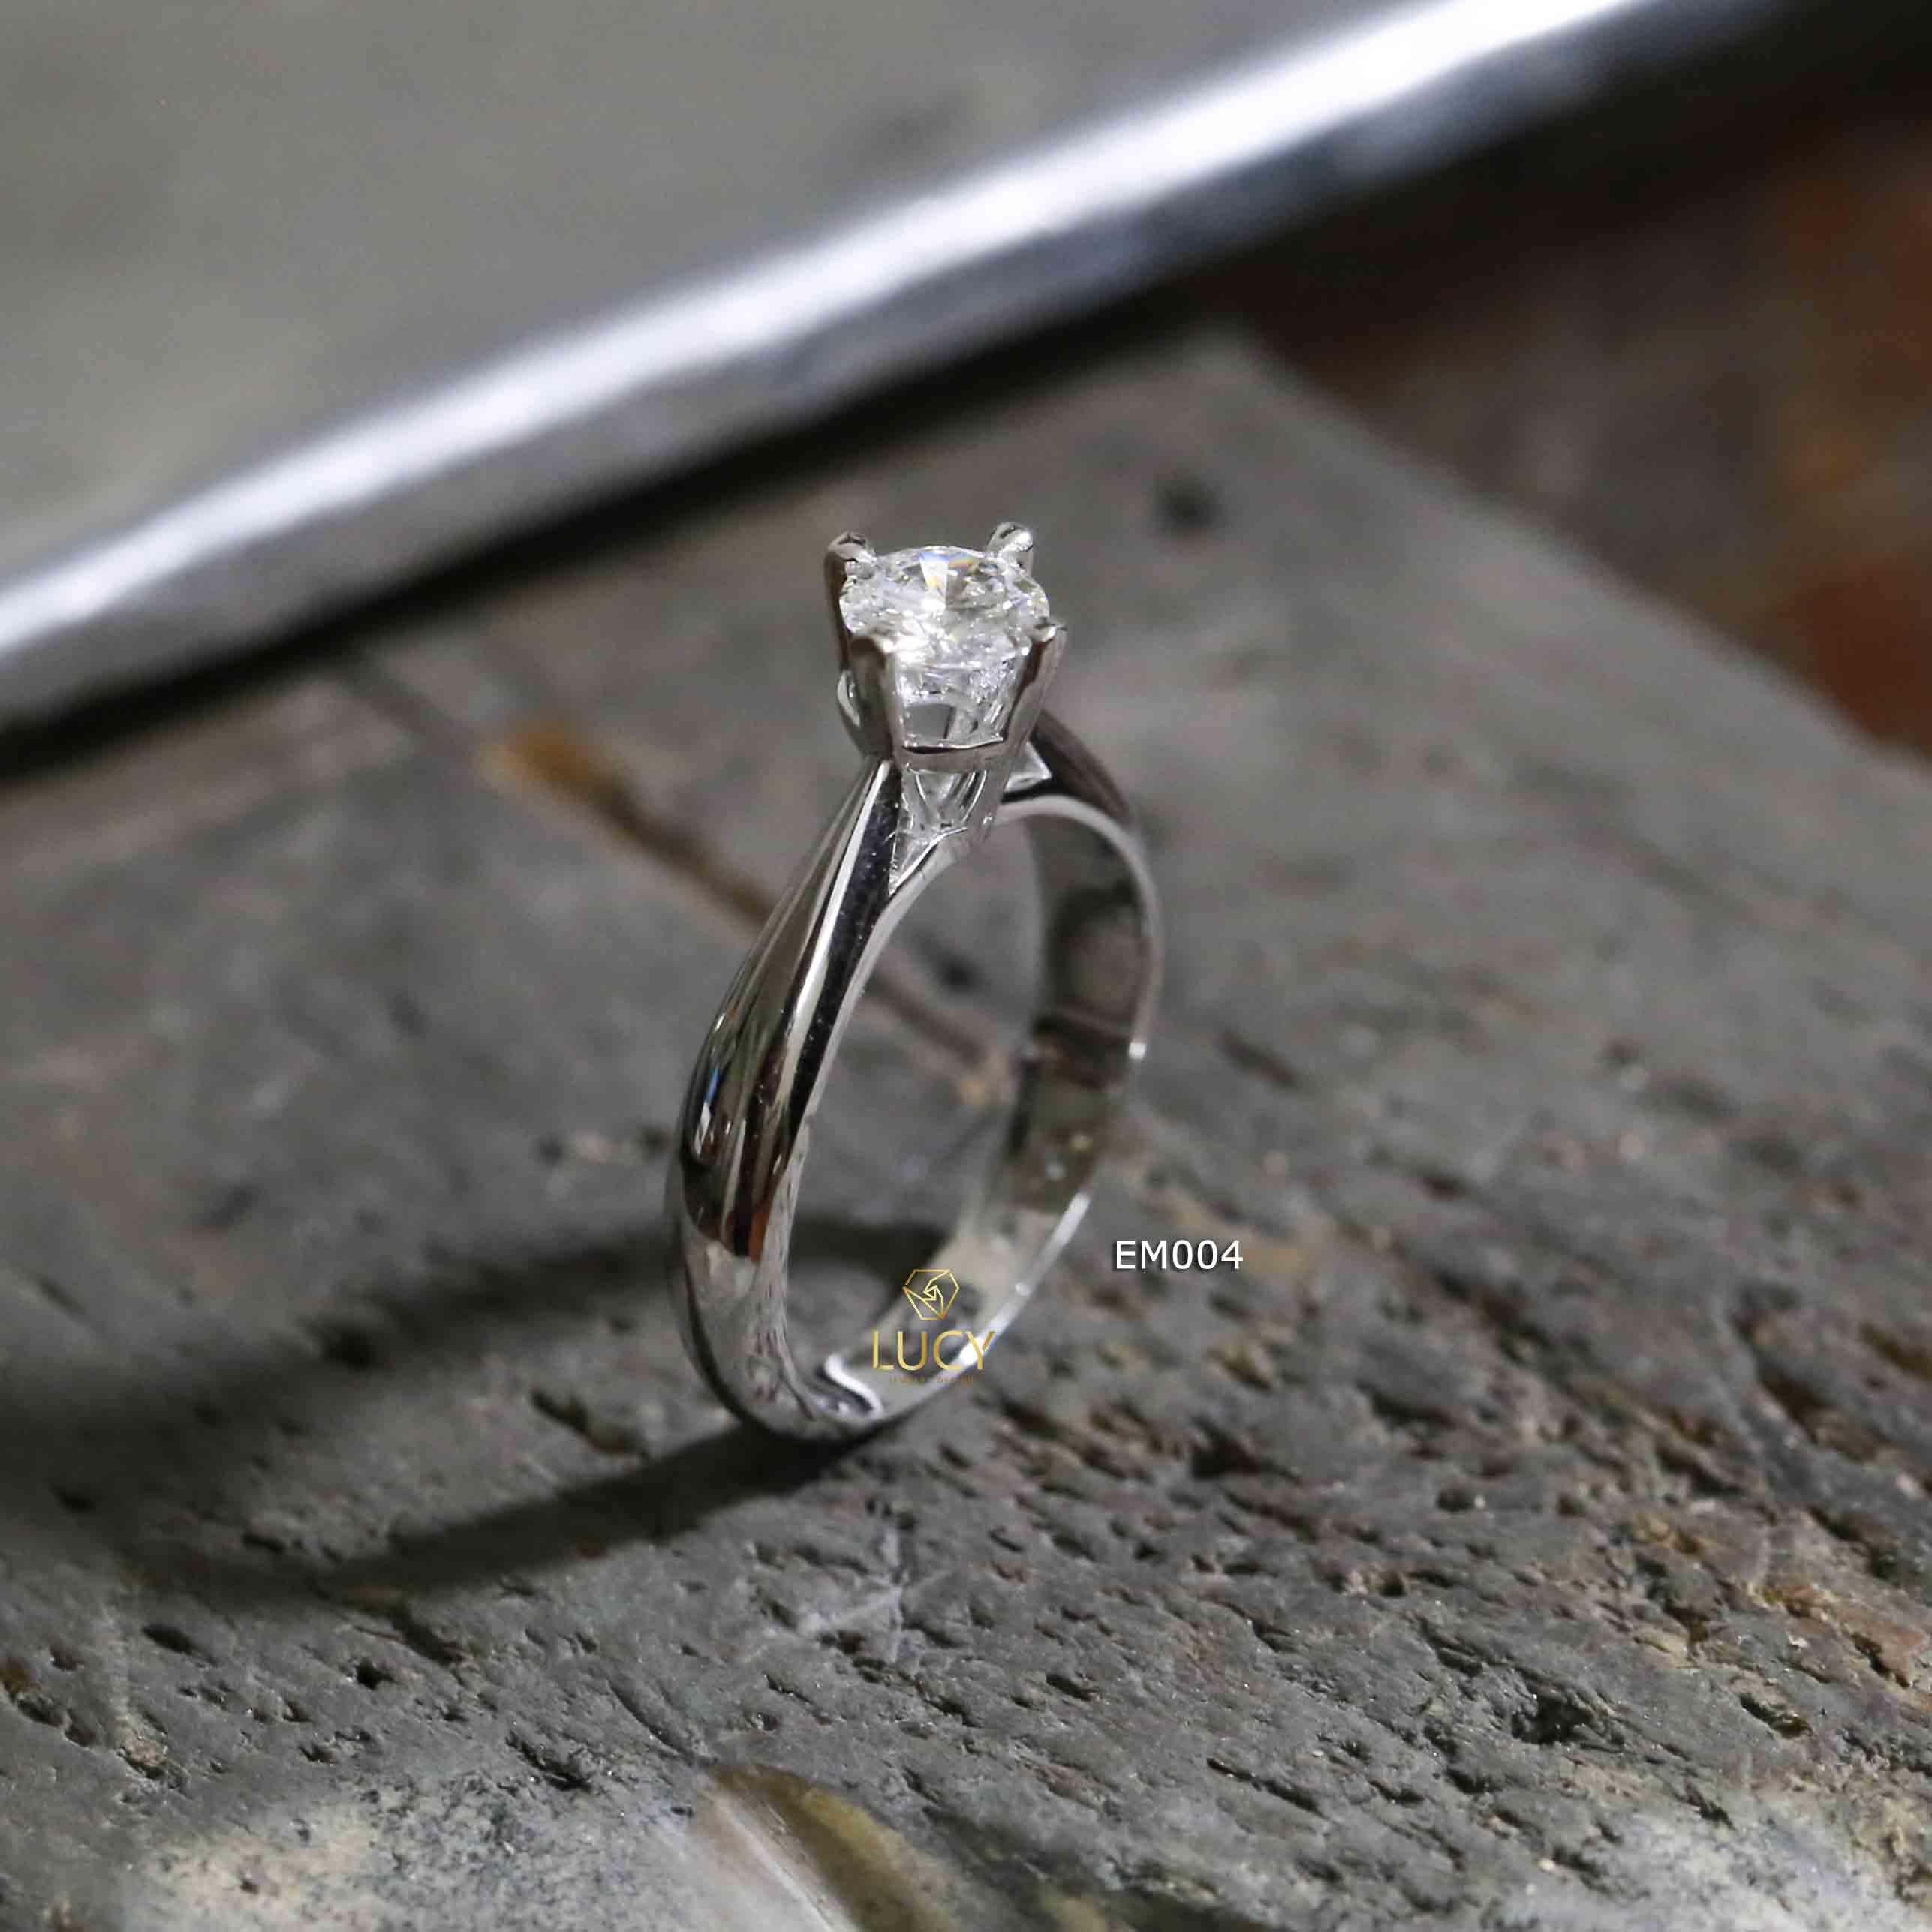 EM004 Nhẫn nữ thiết kế, nhẫn ổ kim 5mm, nhẫn nữ vàng, nhẫn cầu hôn, nhẫn đính hôn - Lucy Jewelry